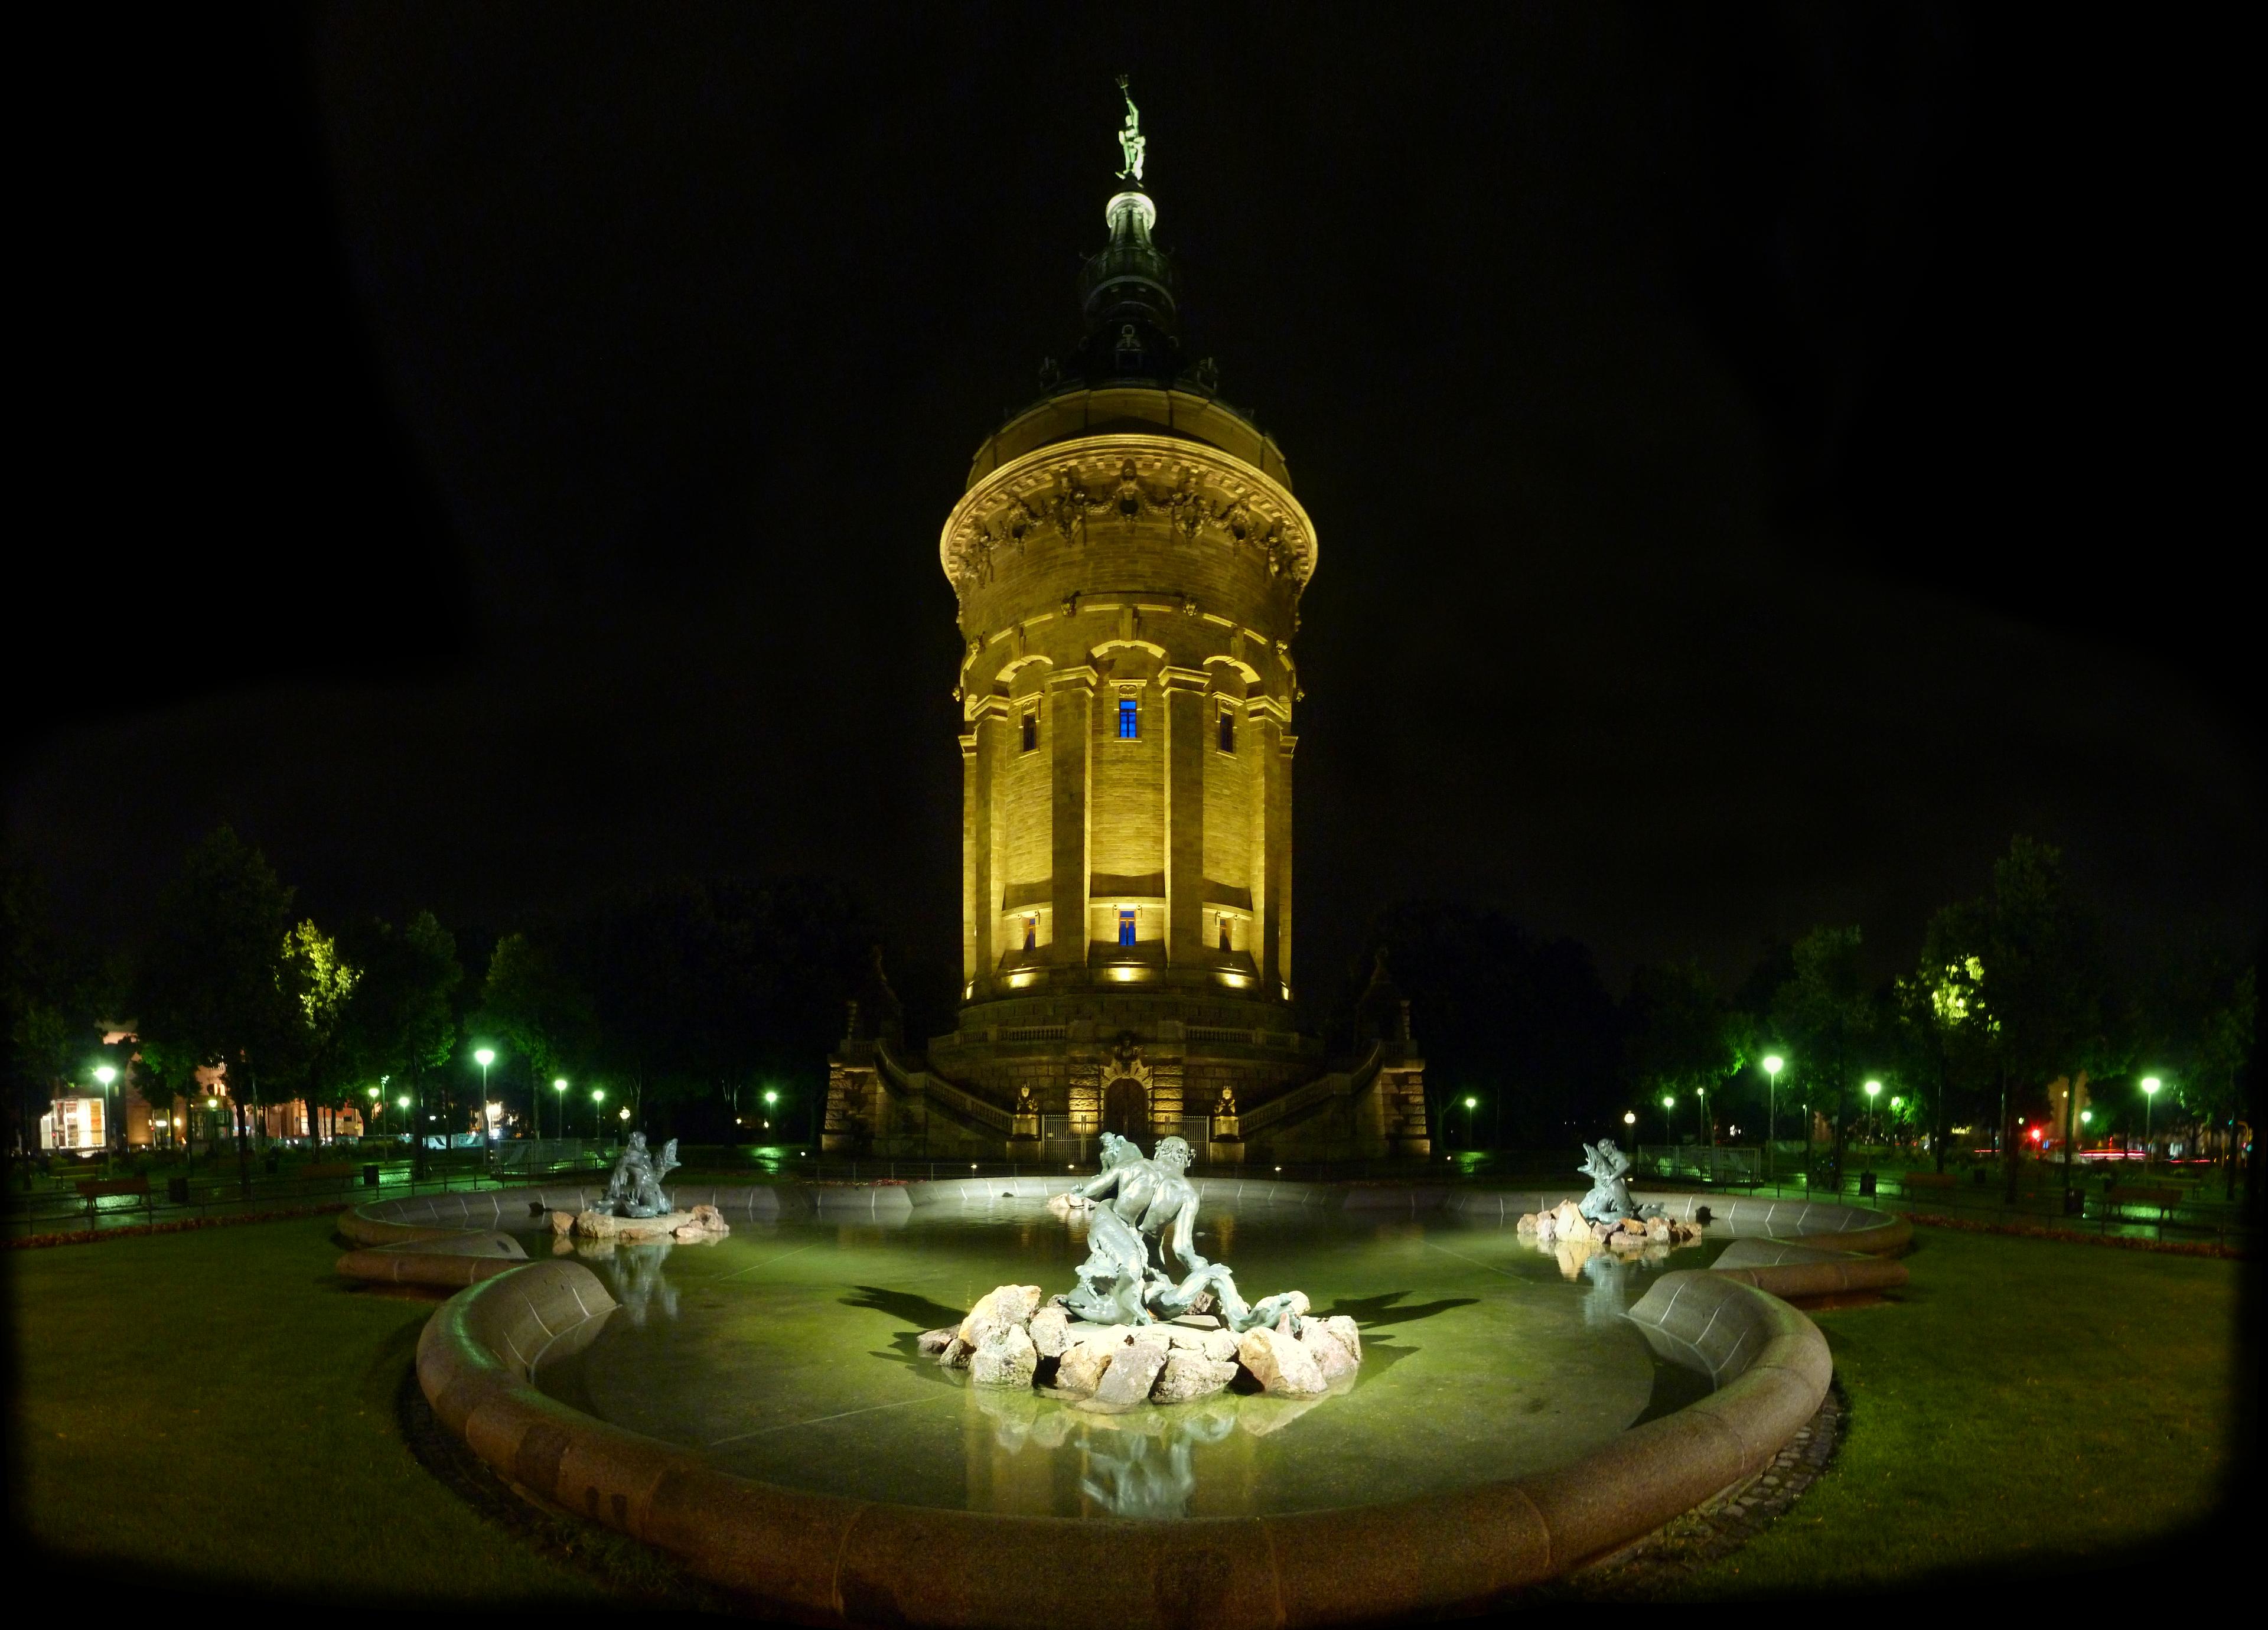 Mannheim: Wasserturm & Meeresgott bei Nacht